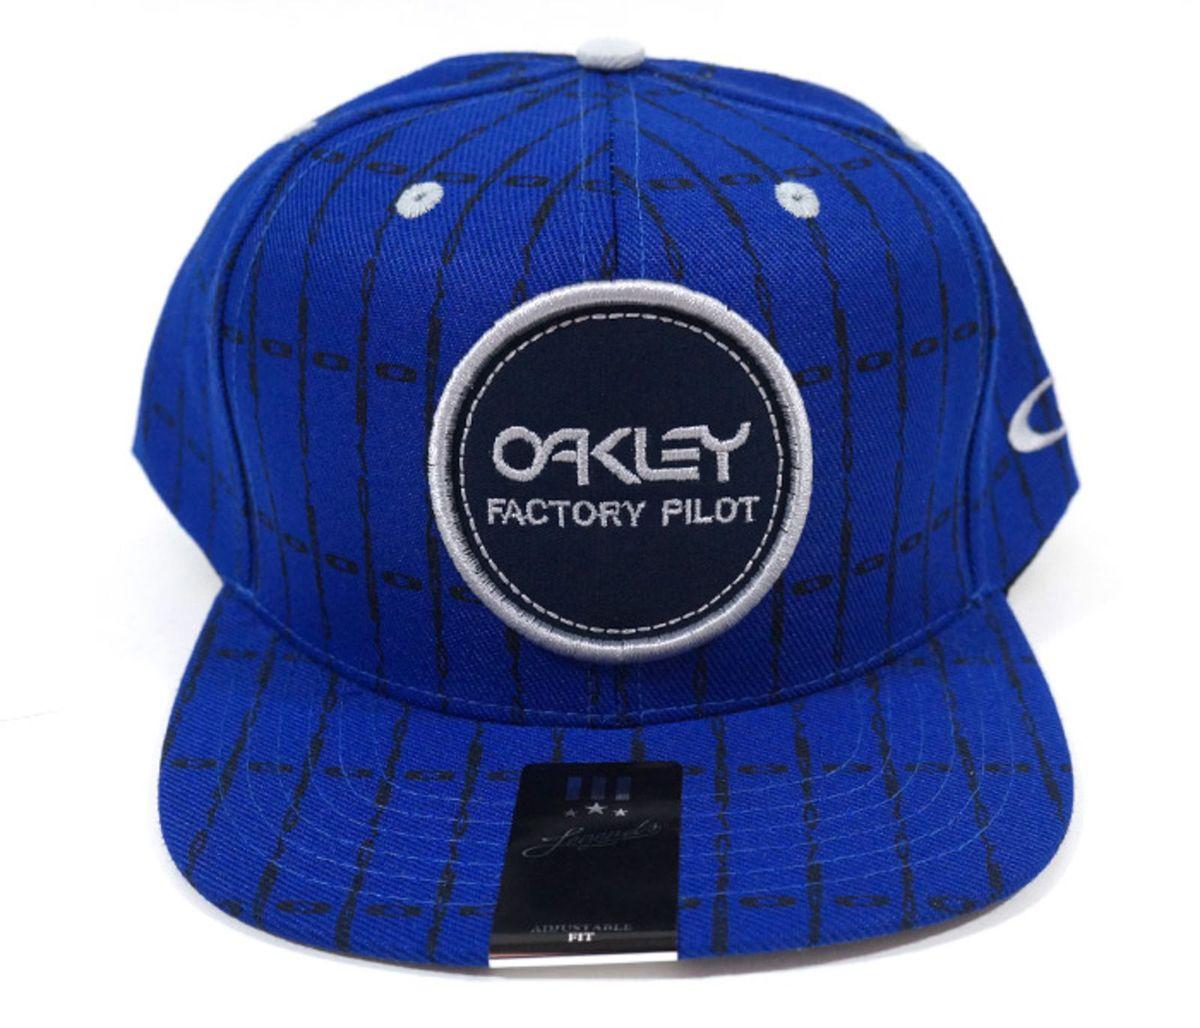 boné aba reta oakley azul - bonés oakley.  Czm6ly9wag90b3muzw5qb2vplmnvbs5ici9wcm9kdwn0cy83ntc3nzc1lzyyodk3mmnkngezngqzmzawzgi4ndg5otq1zjlmy2jllmpwzw  ... a2c3ffca756ee